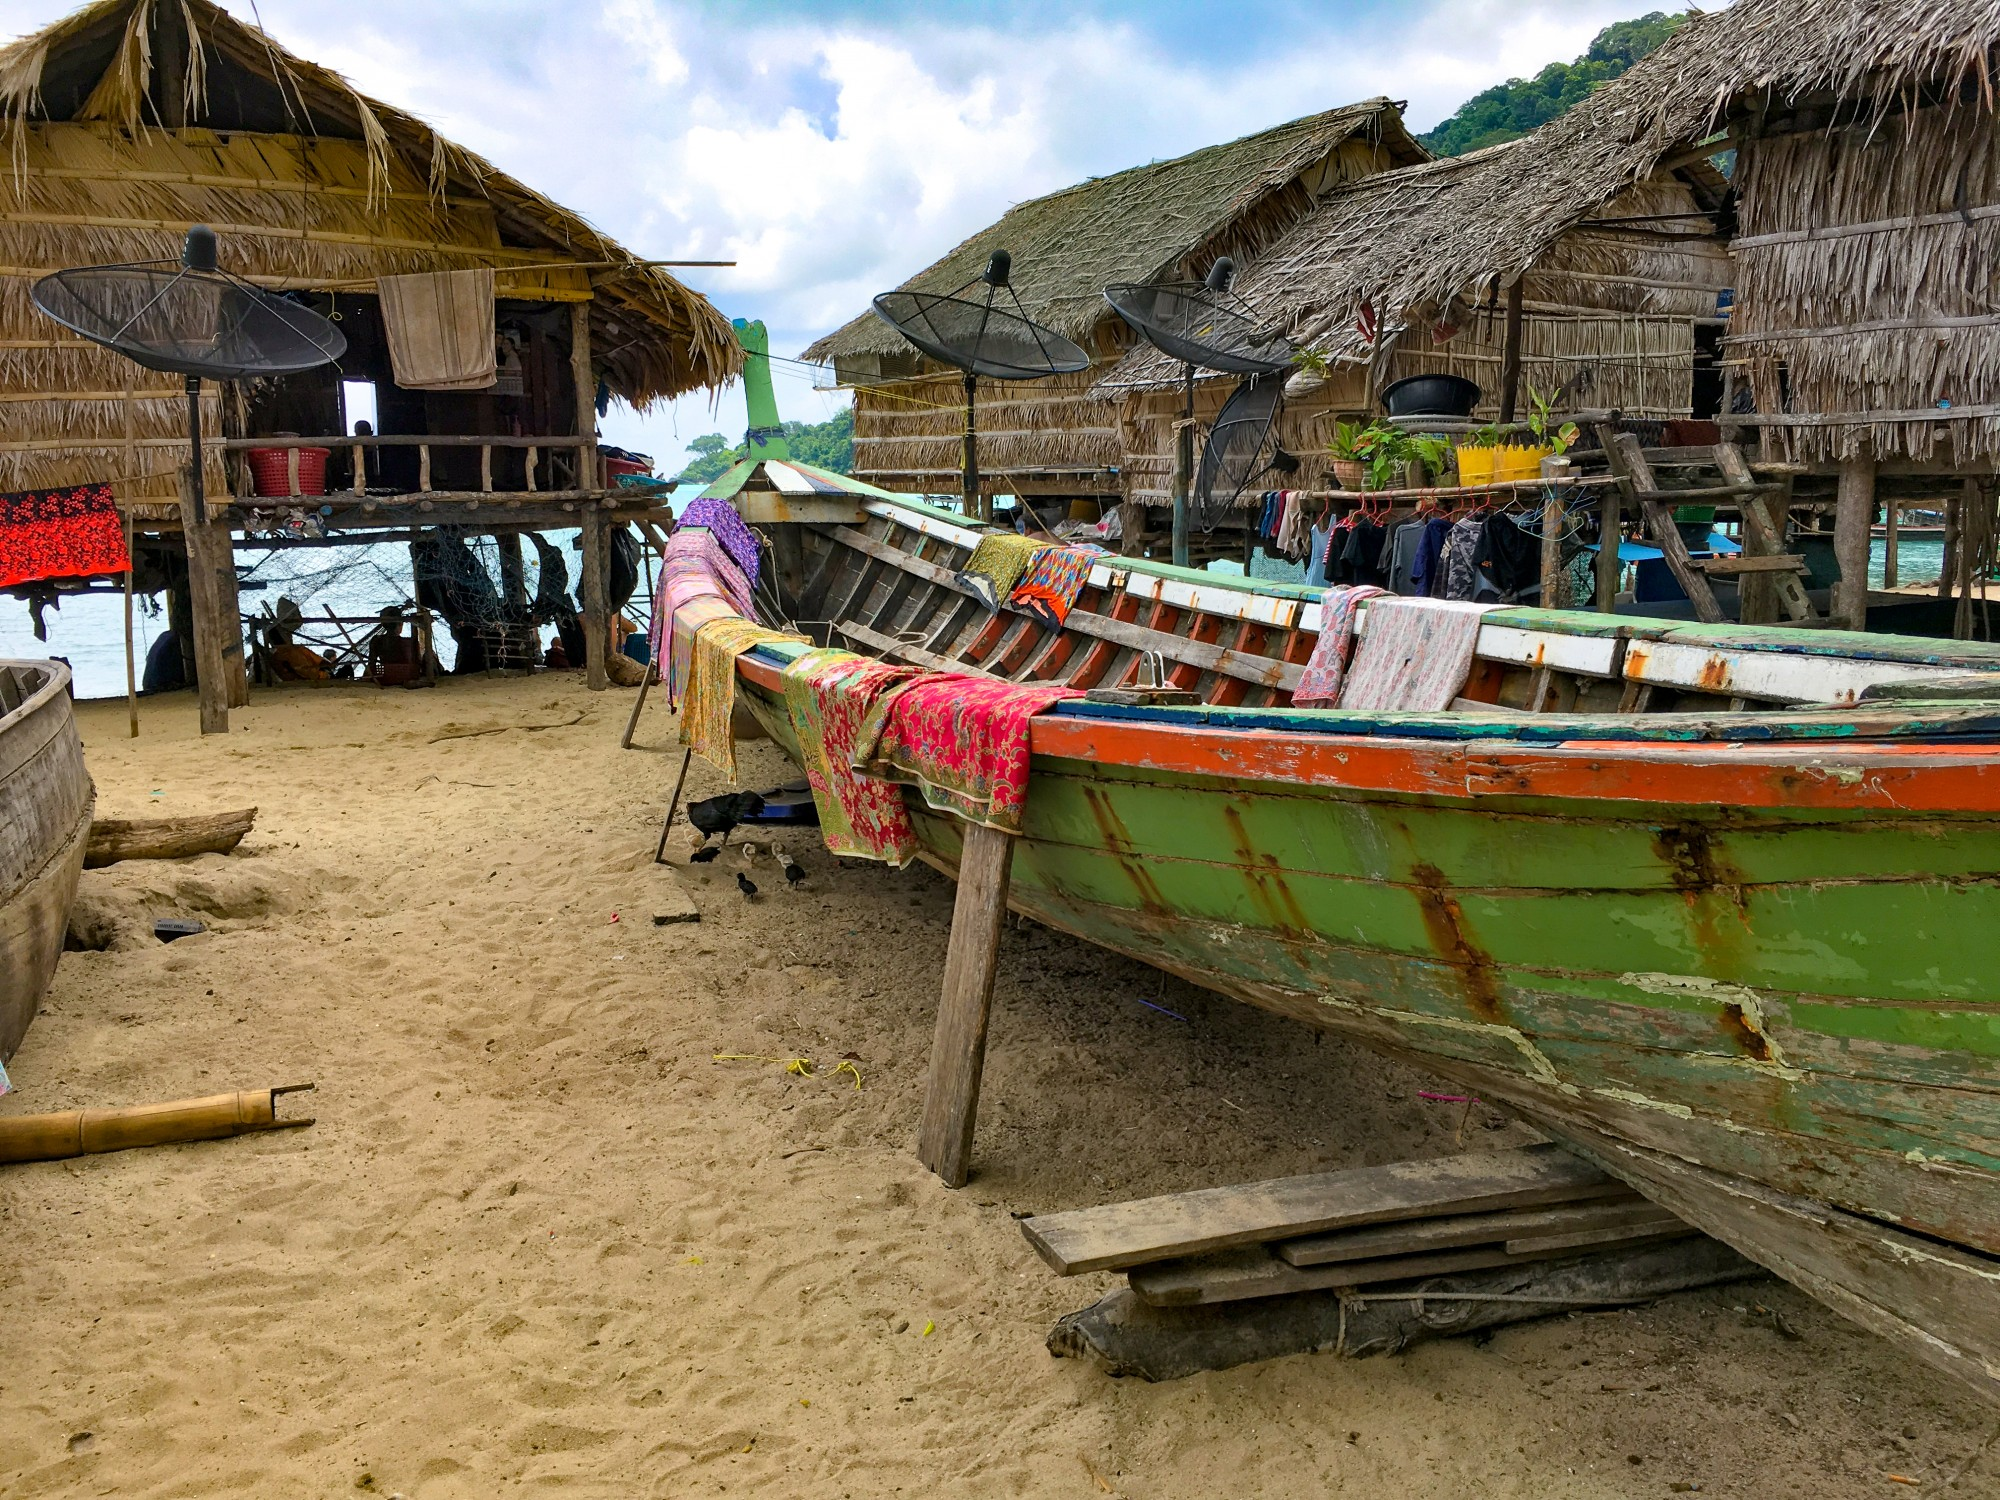 Moken Village Sea Gypsies Thailand